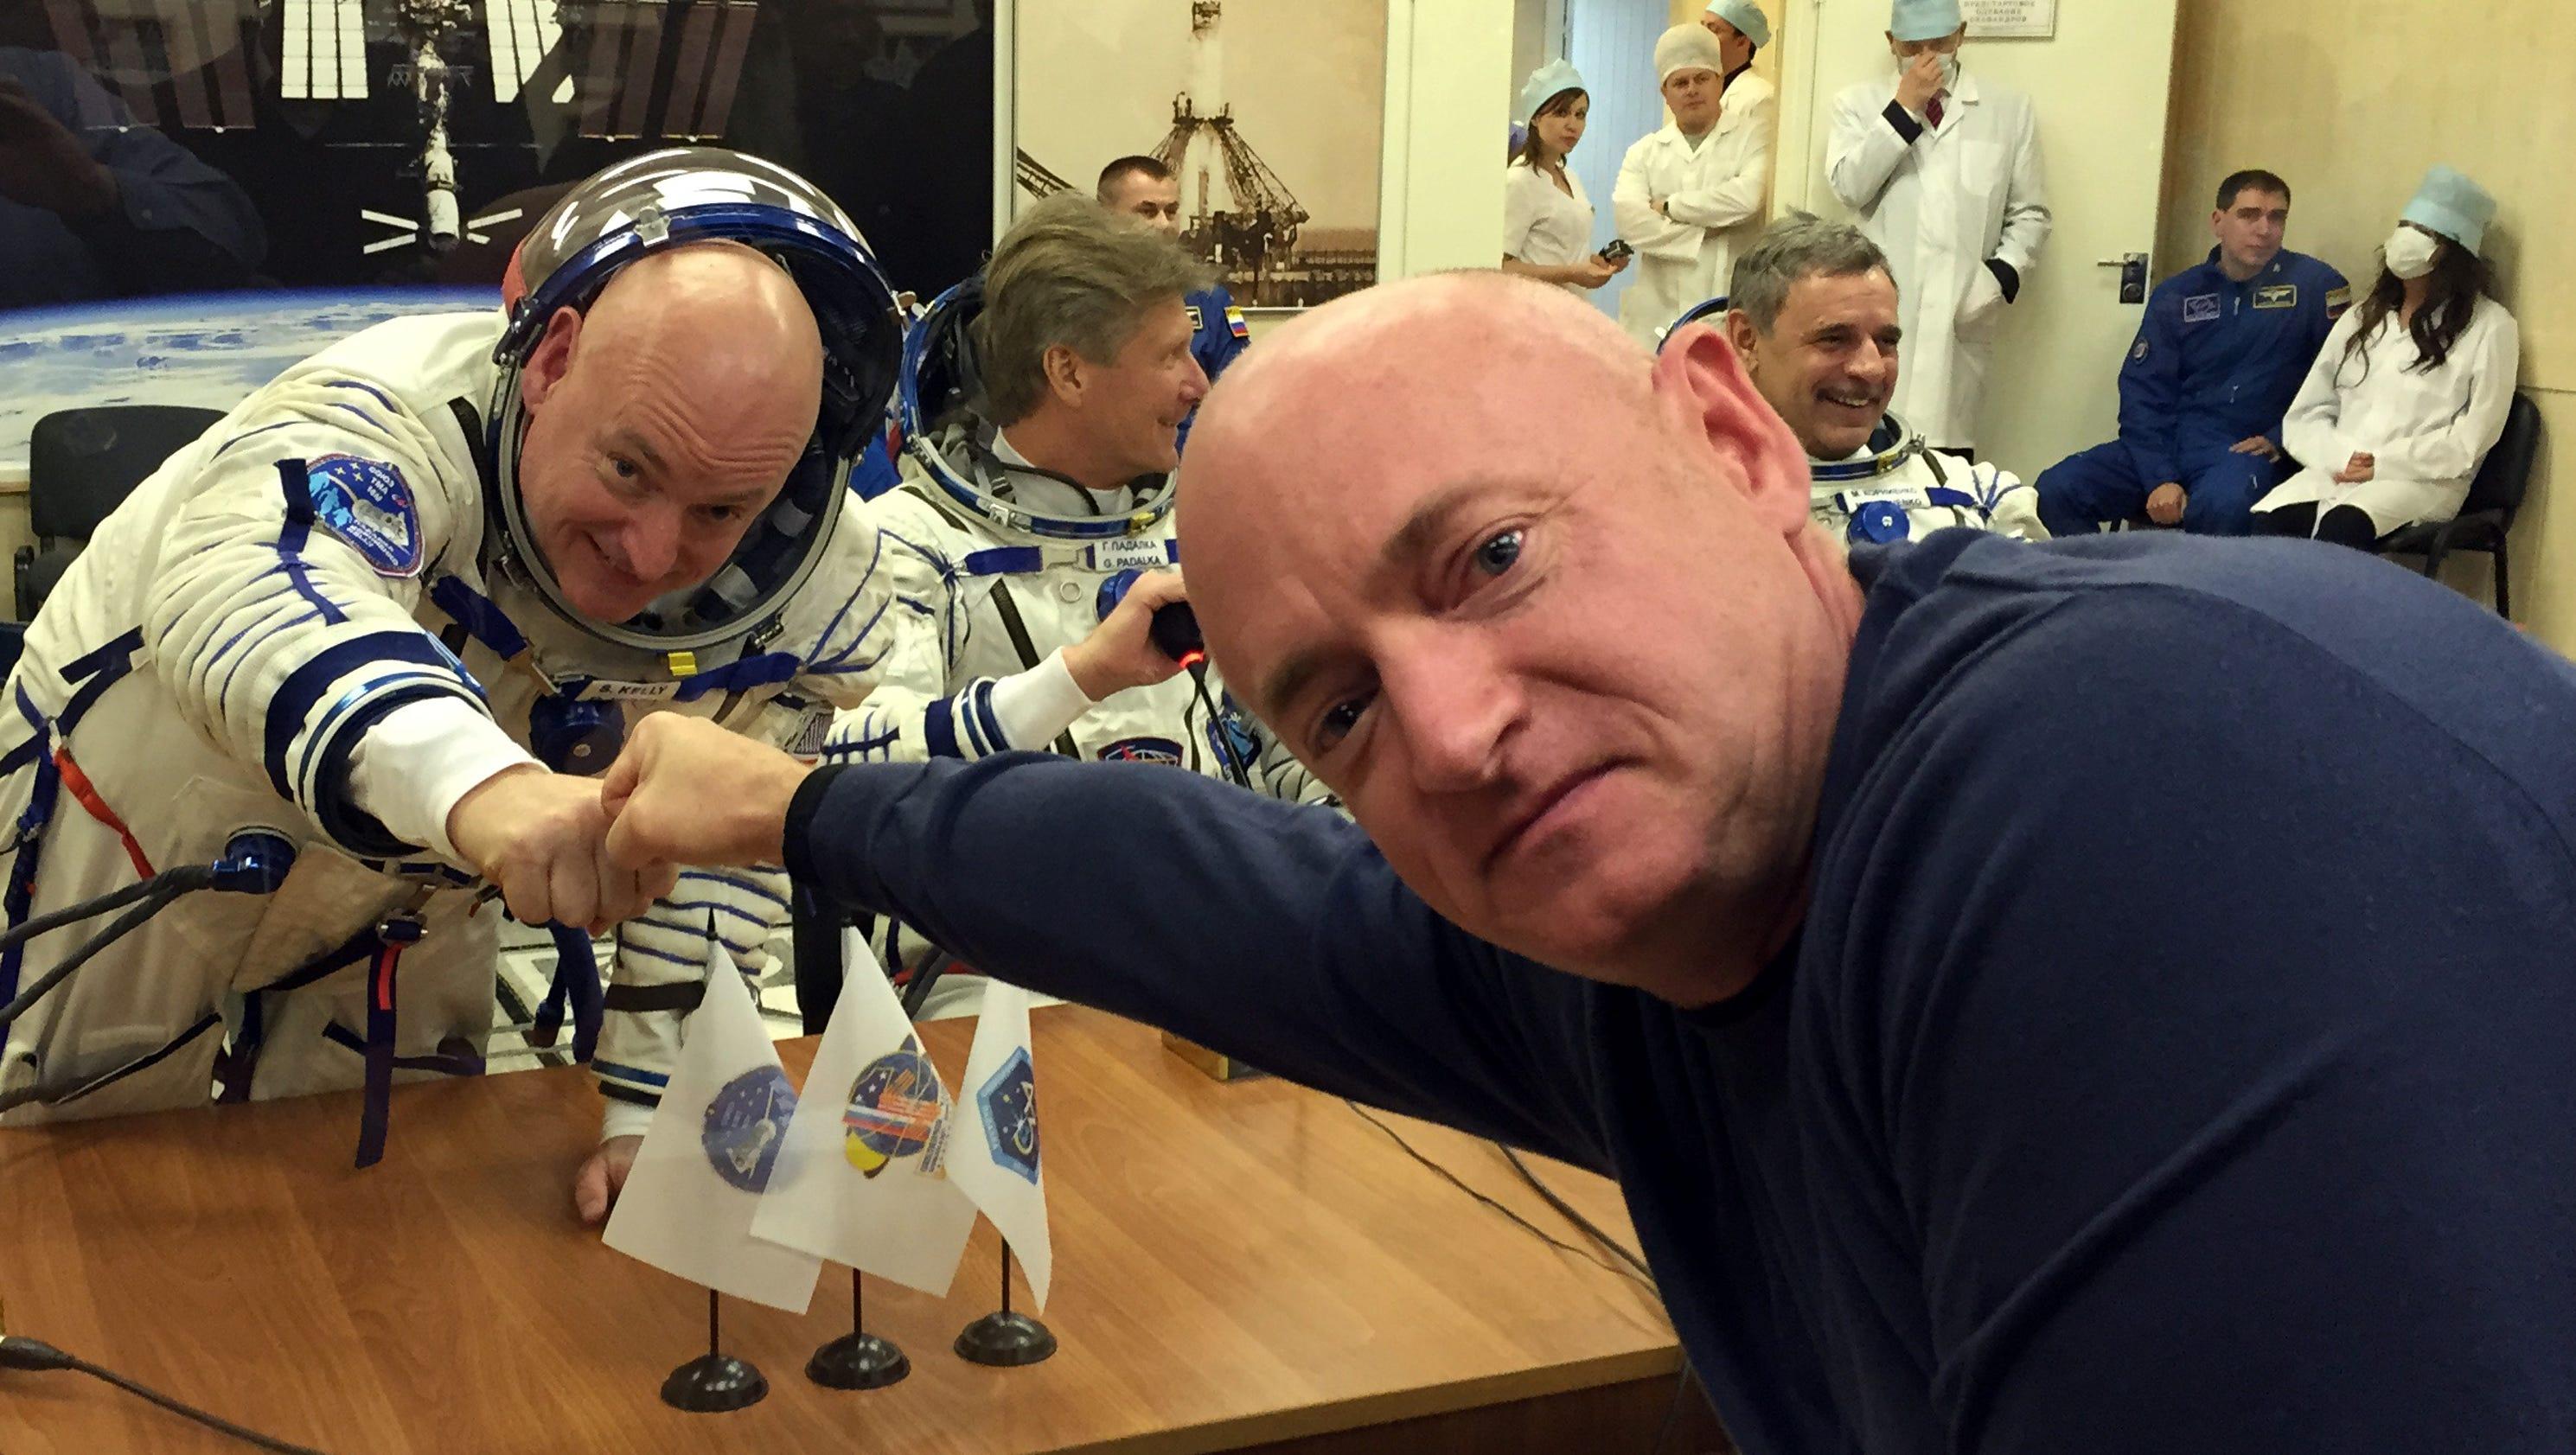 merchant marine academy astronaut mark kelly - photo #44